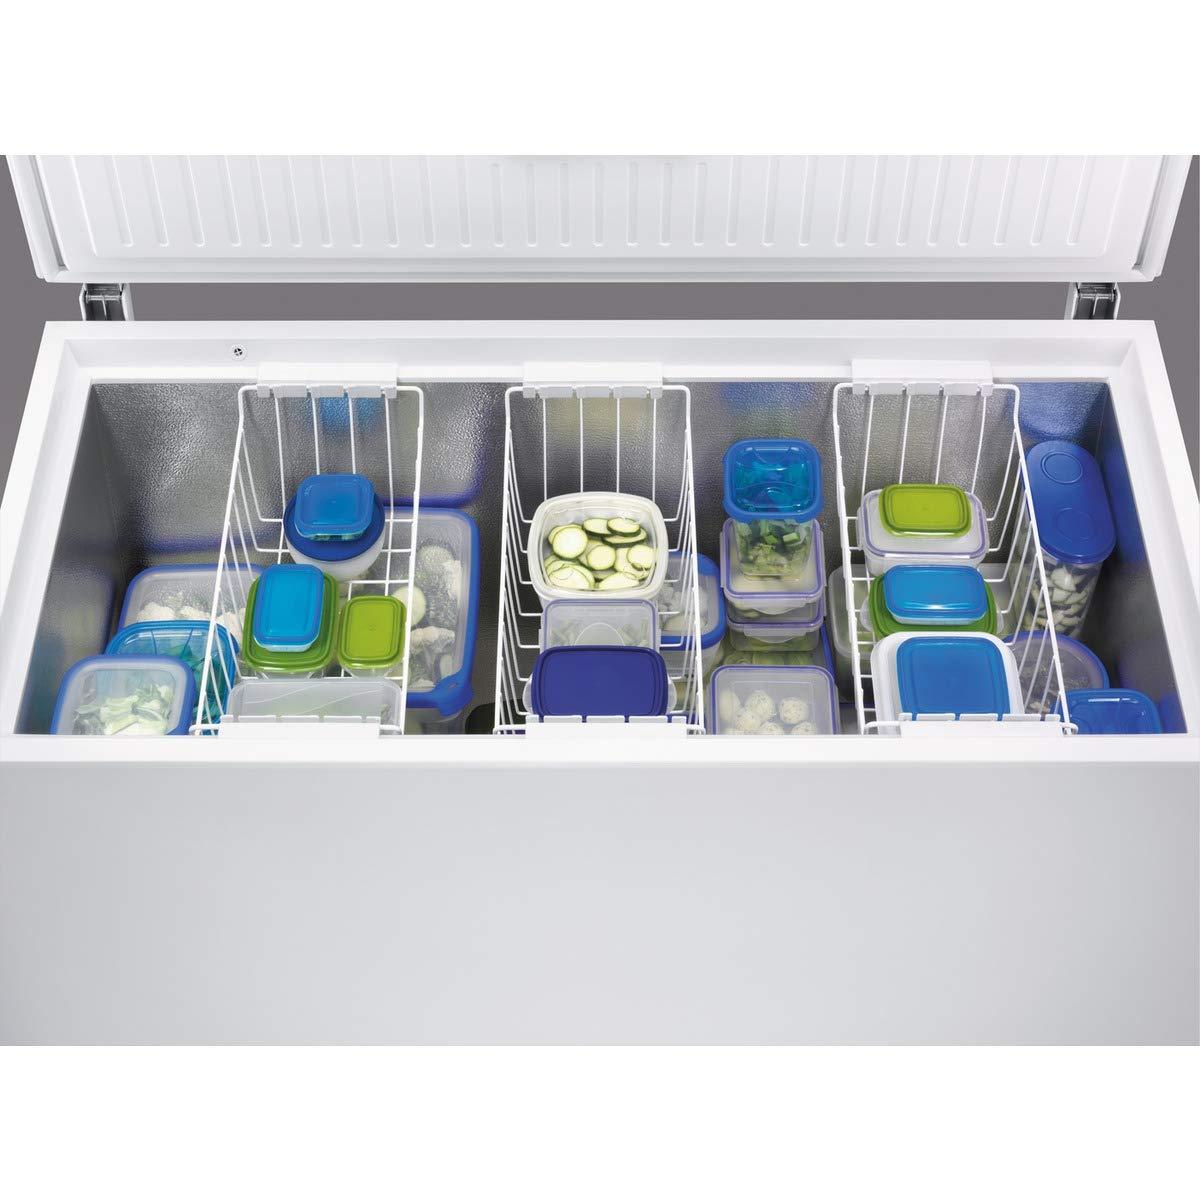 Zanussi ZFC31400WA Arcón congelador, 300 litros, Blanco: 346.64 ...